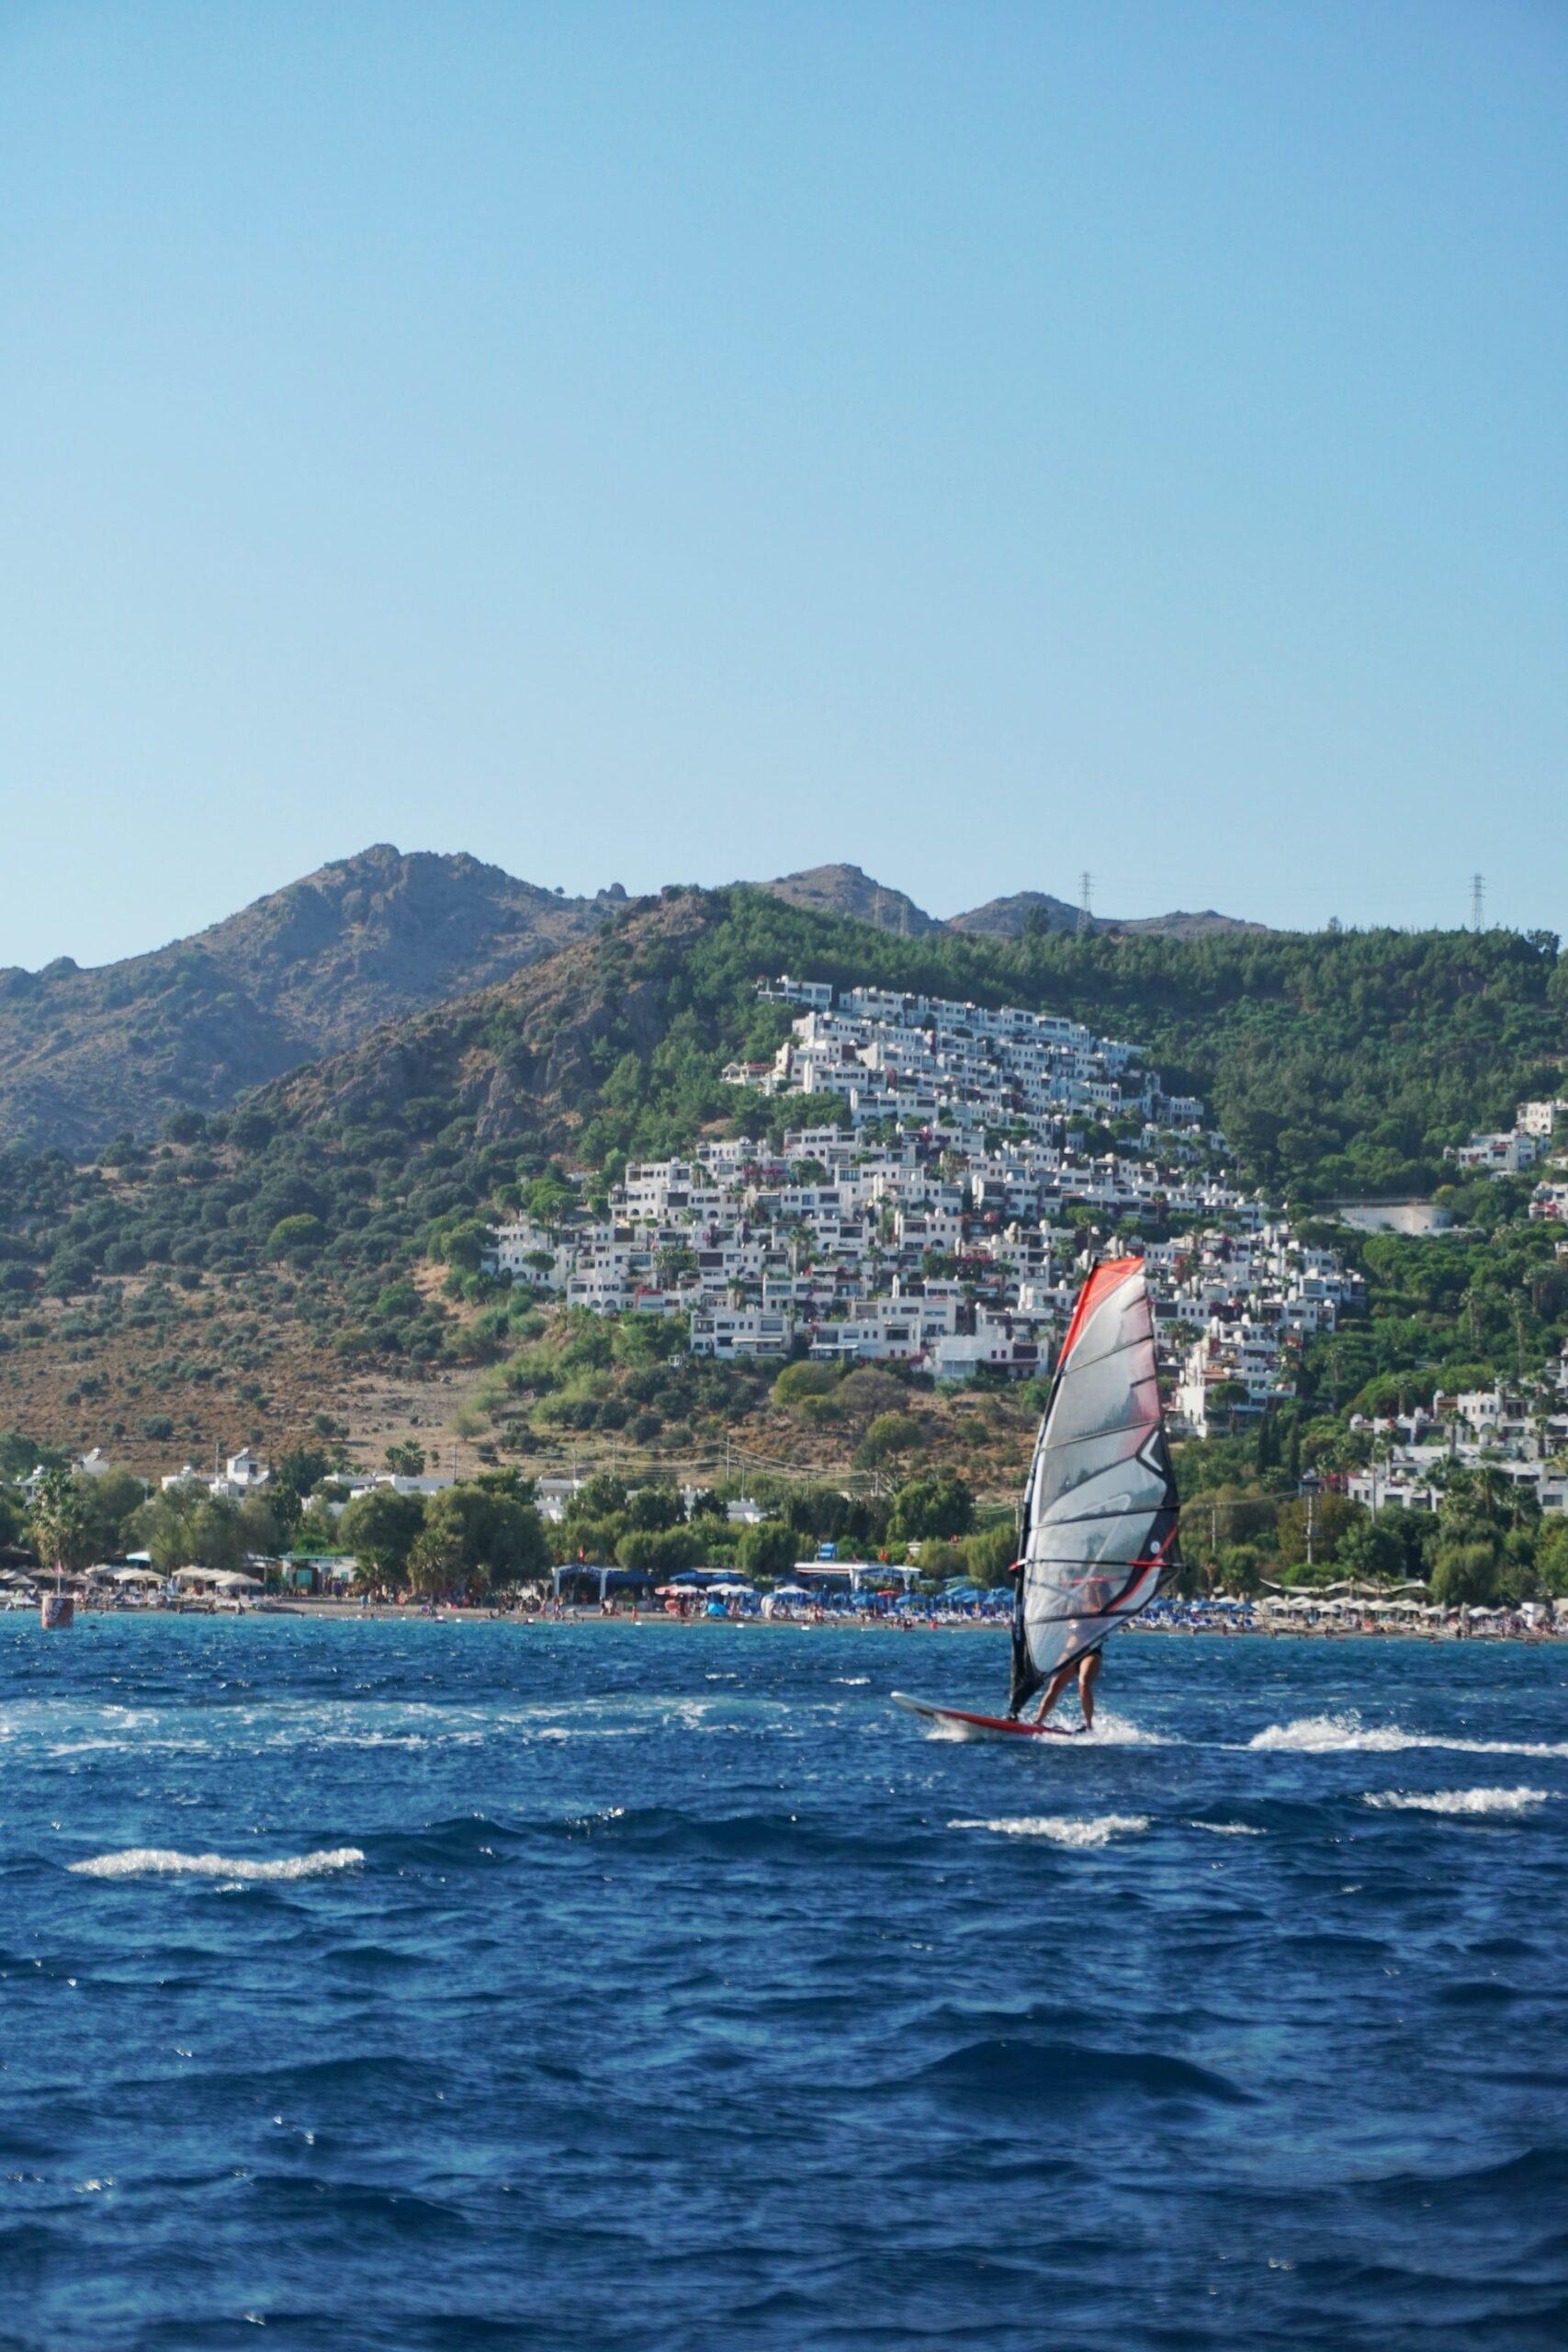 Windsurfing (photo: Keo Oran, Unsplash)